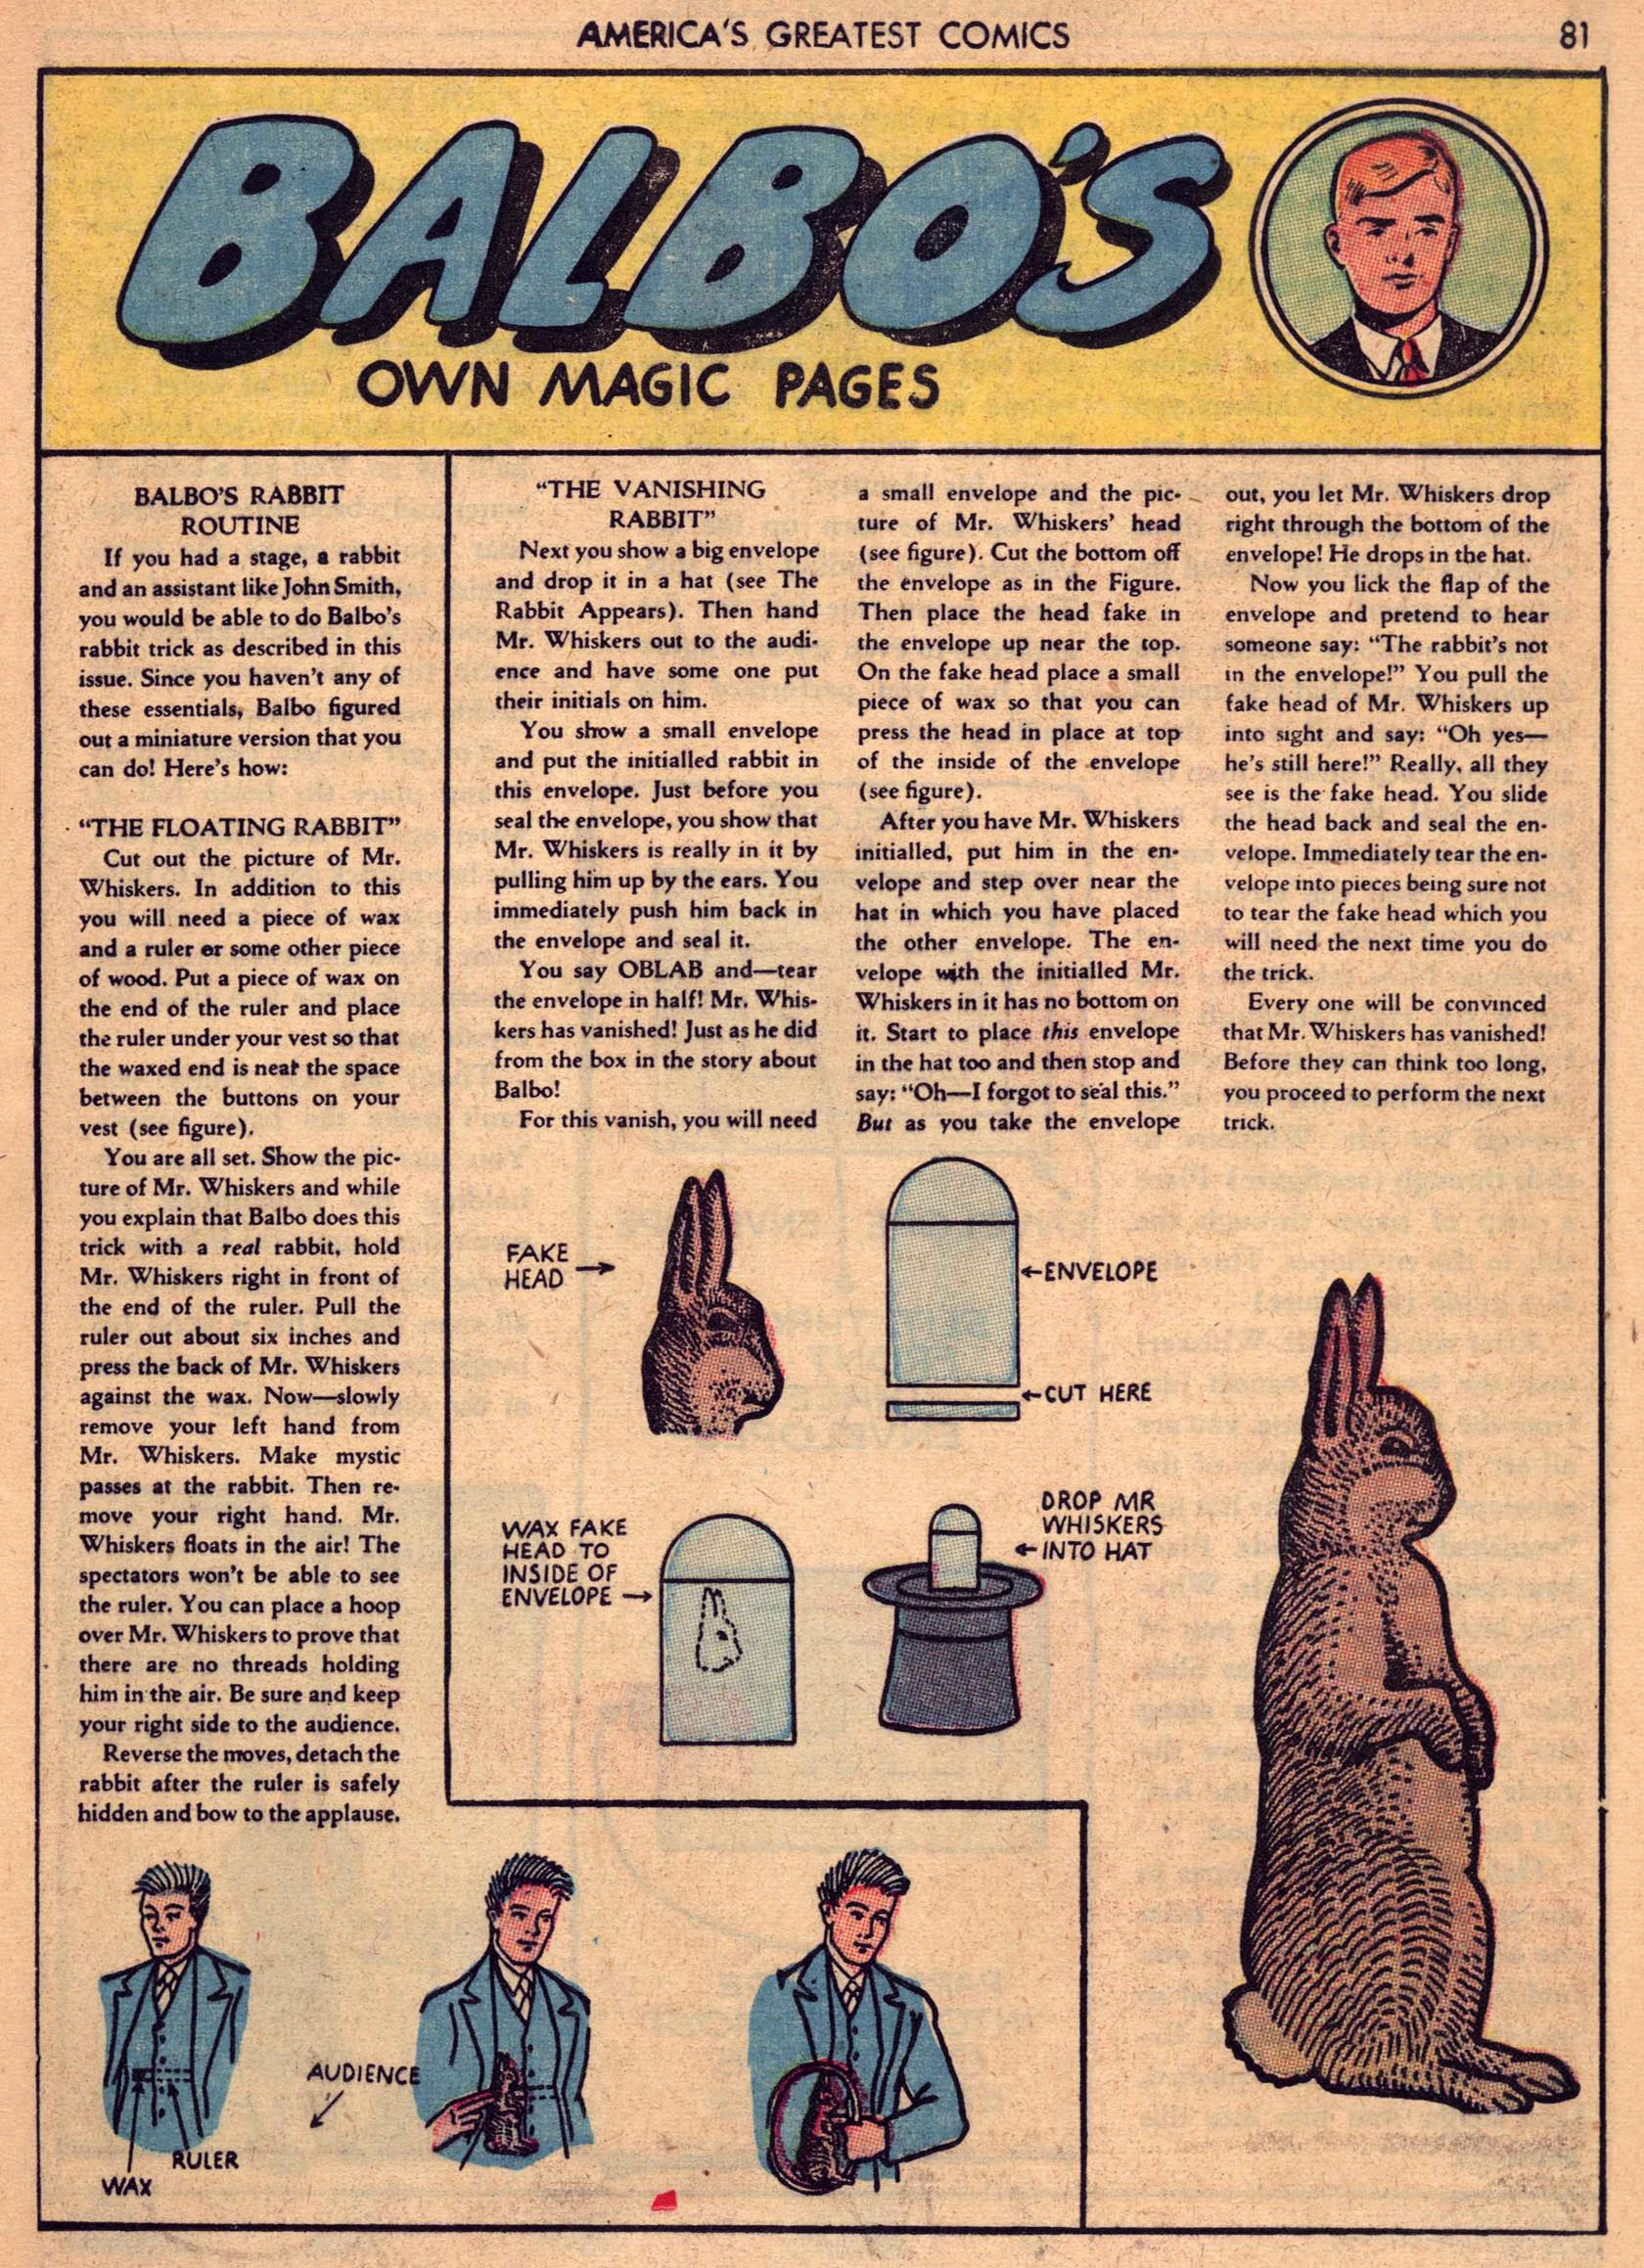 Read online America's Greatest Comics comic -  Issue #7 - 80